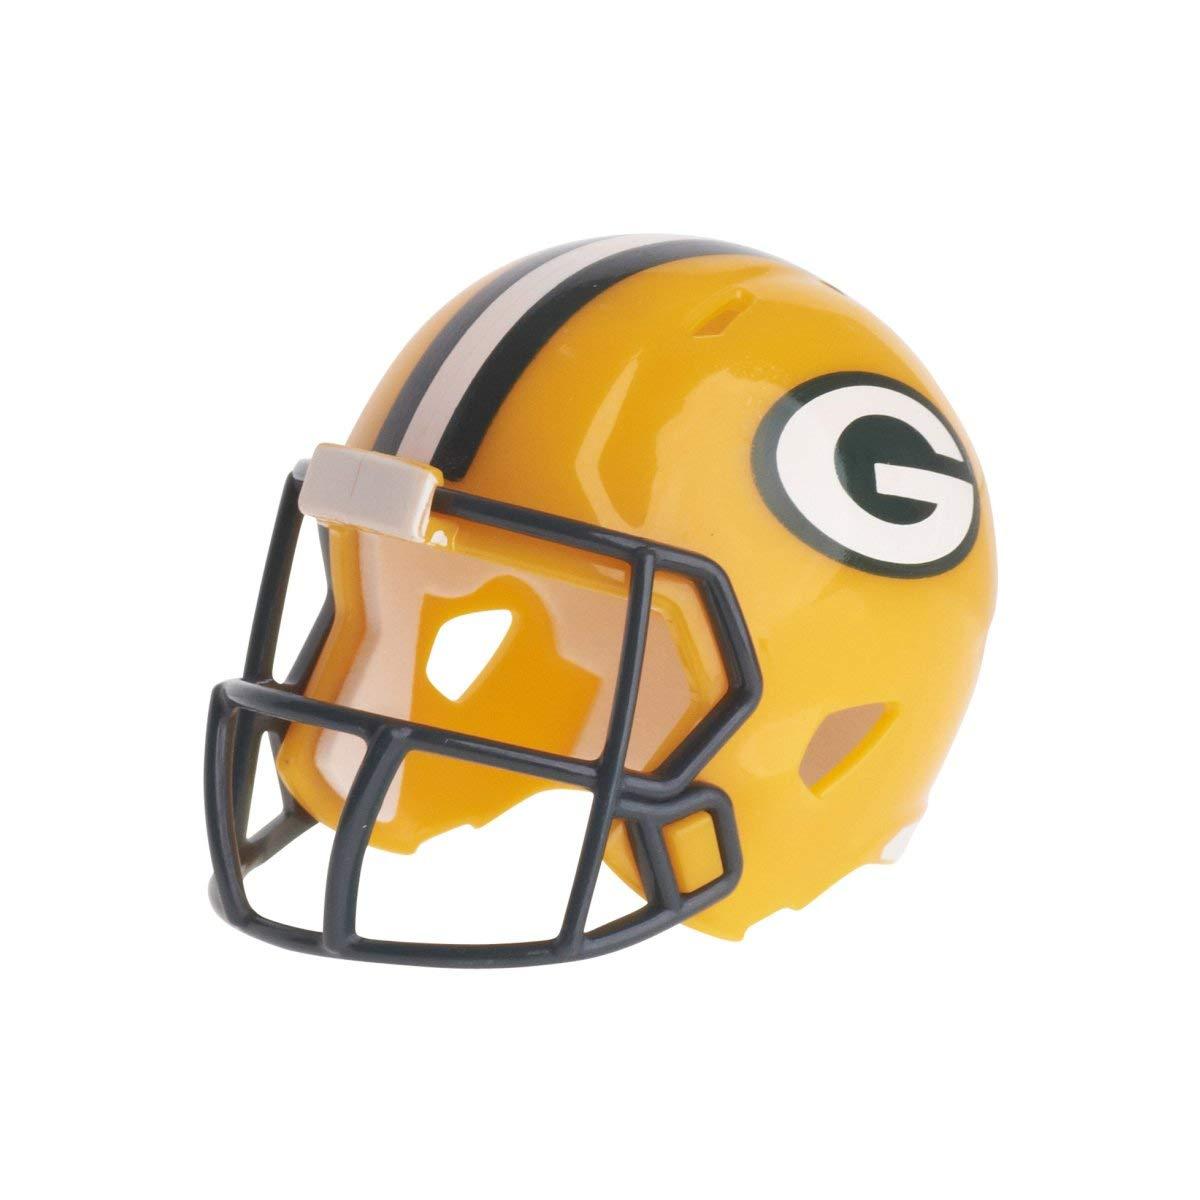 Riddell Mini-American-Football-Helm, NFL-Team: Green Bay Packers, im Taschenformat. 095855320588